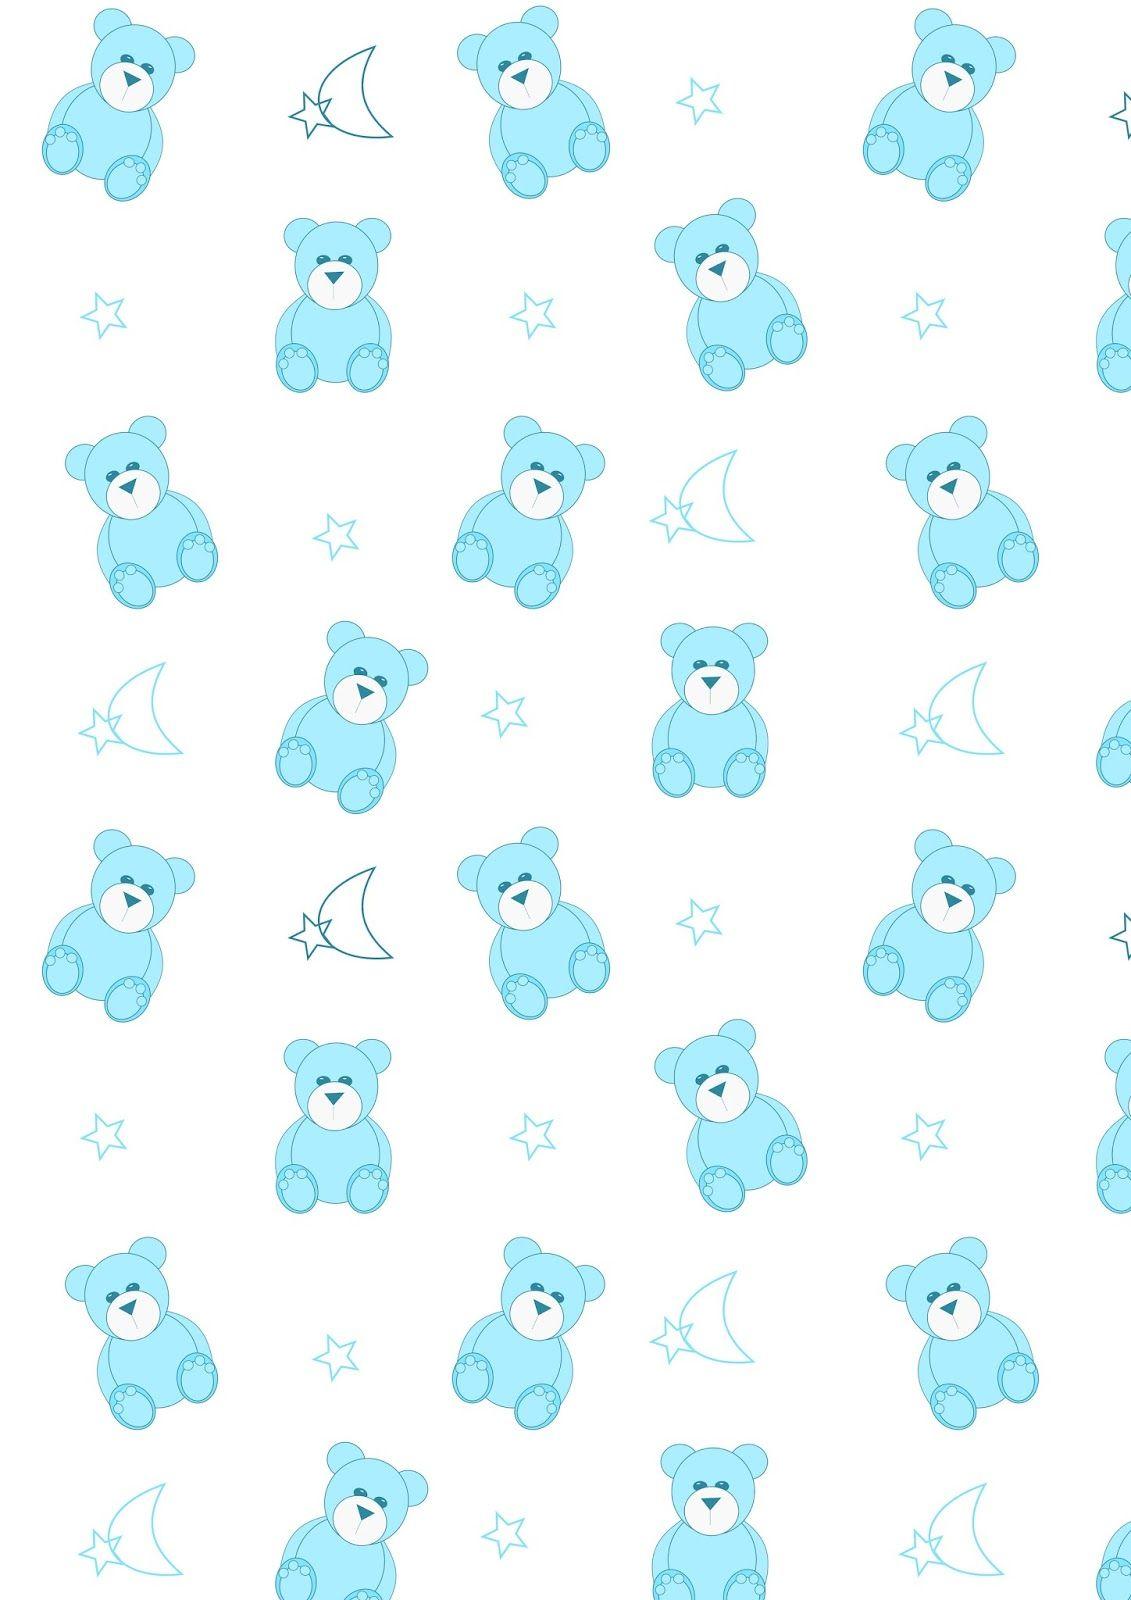 Free Printable Nursery Pattern Paper Babyblue Teddybear